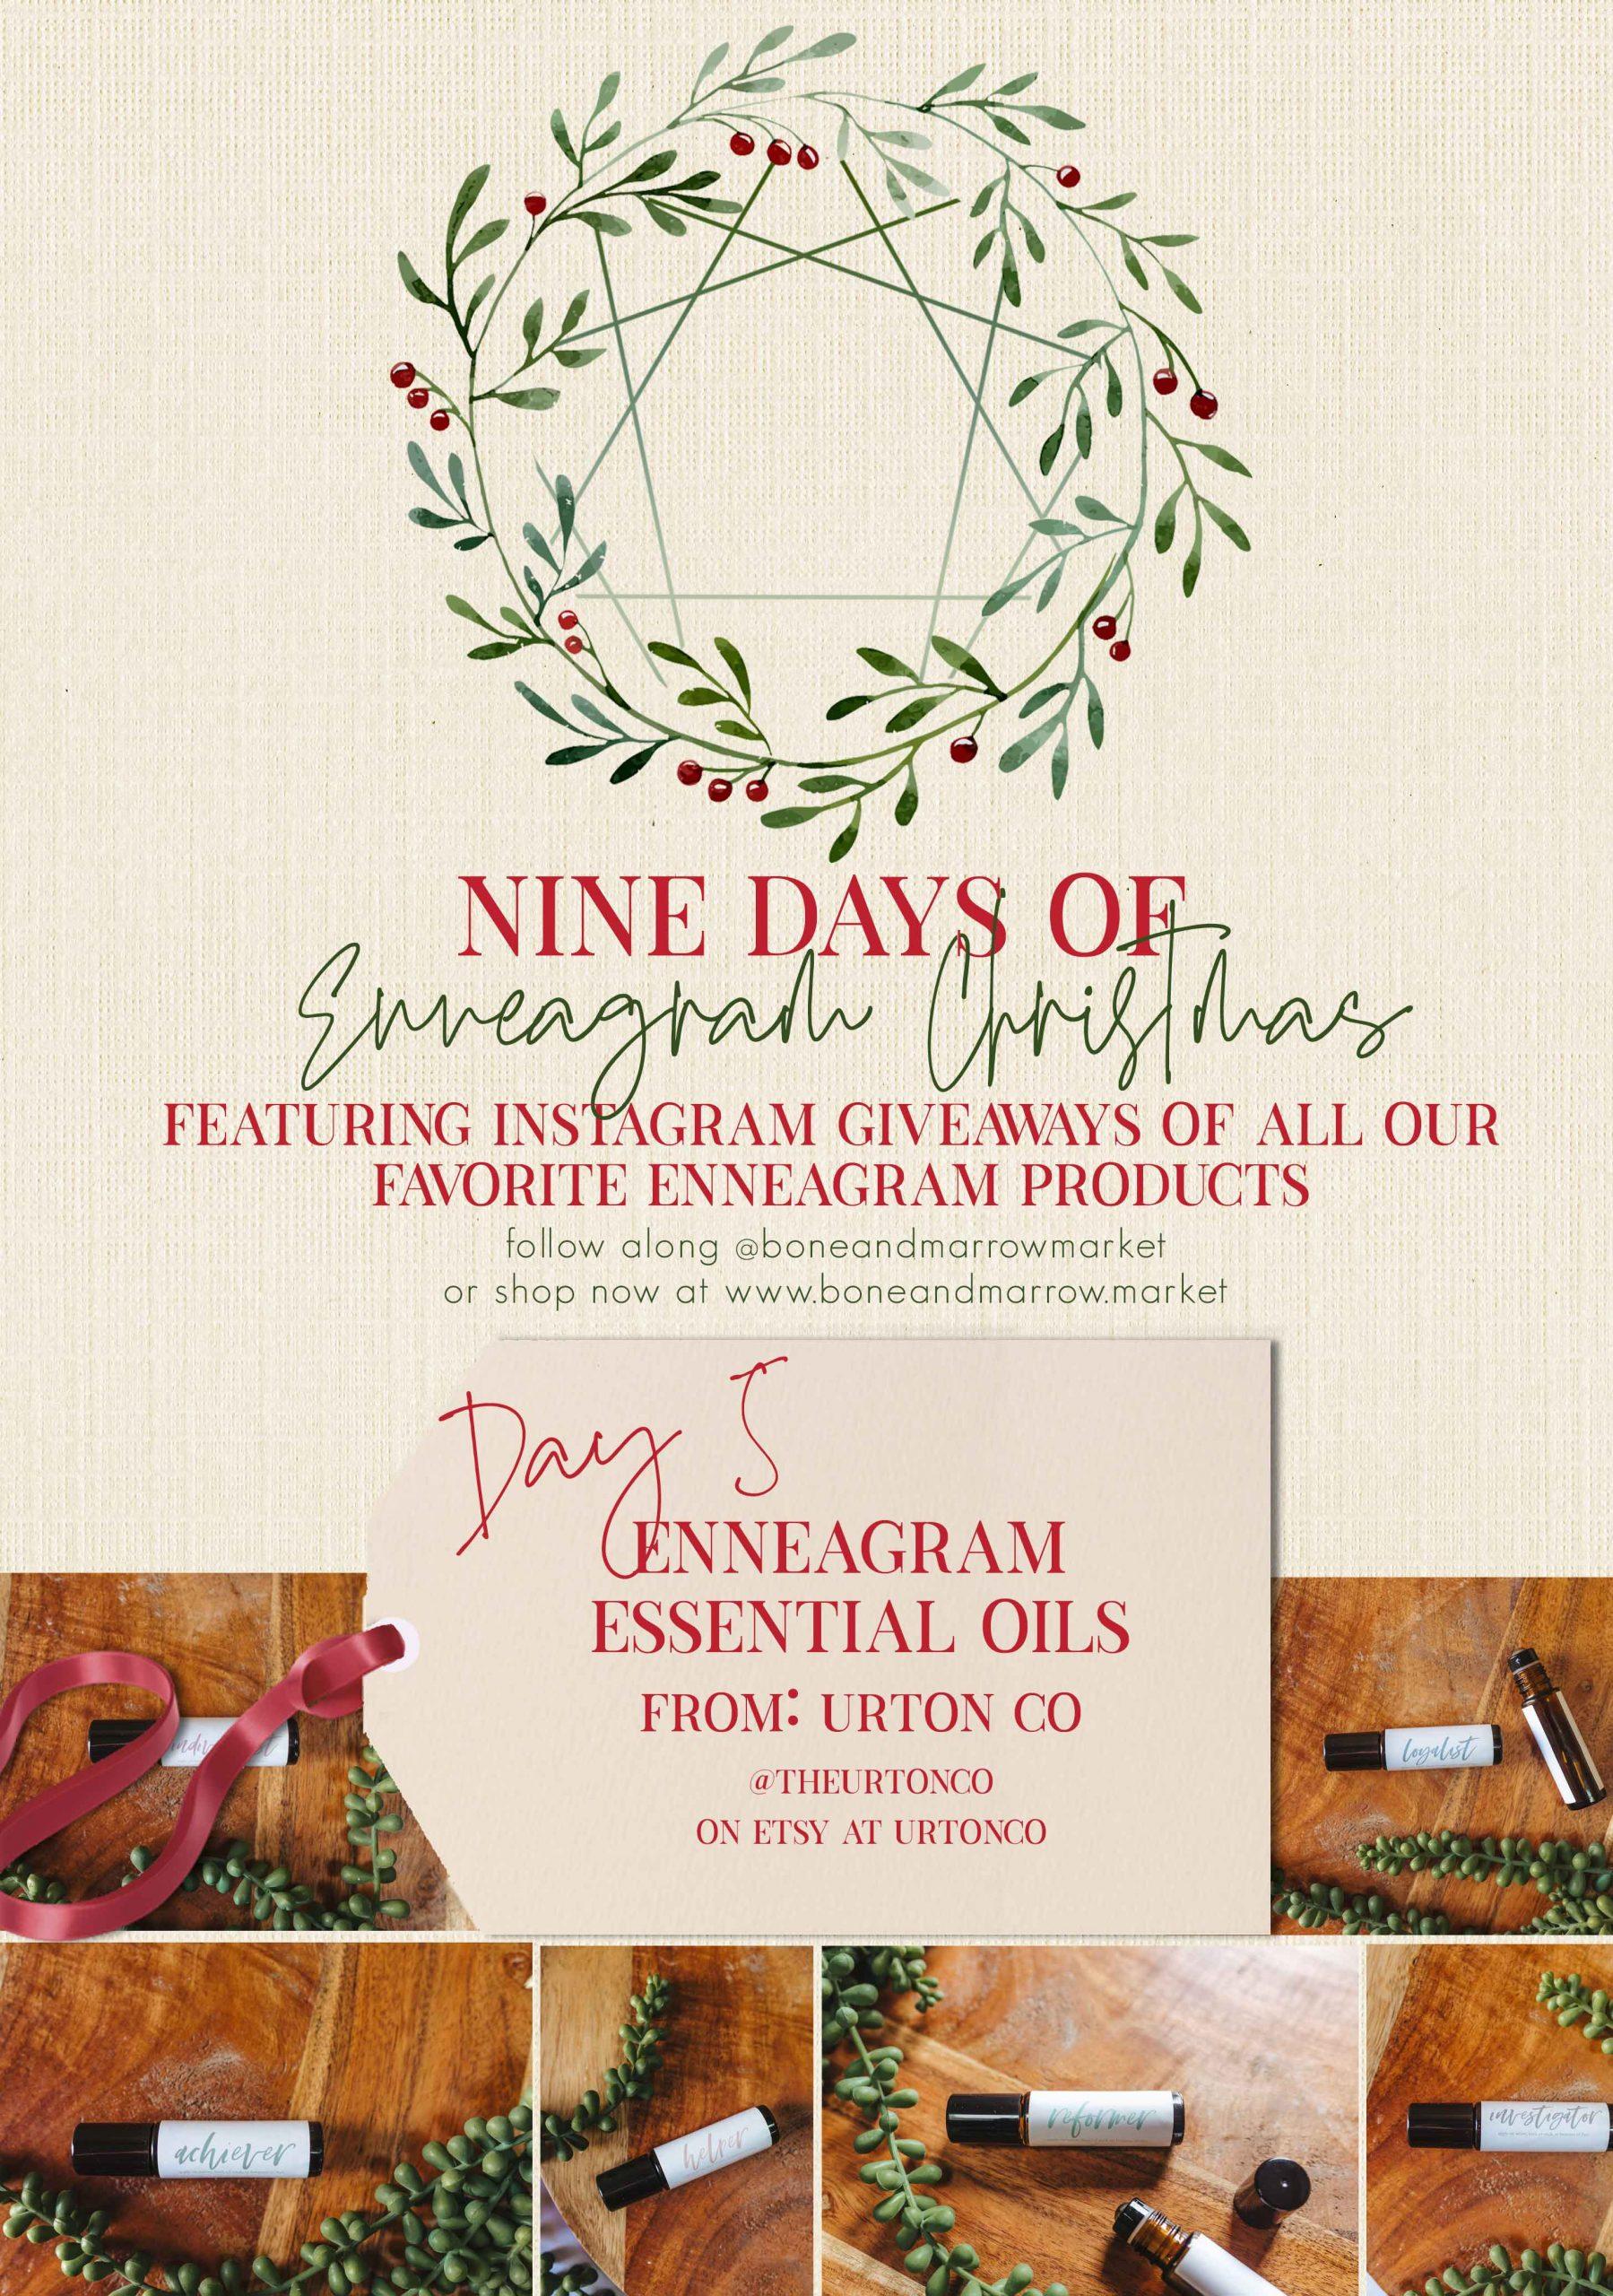 Enneagram Essential Oils | 9 Days of Enneagram Christmas